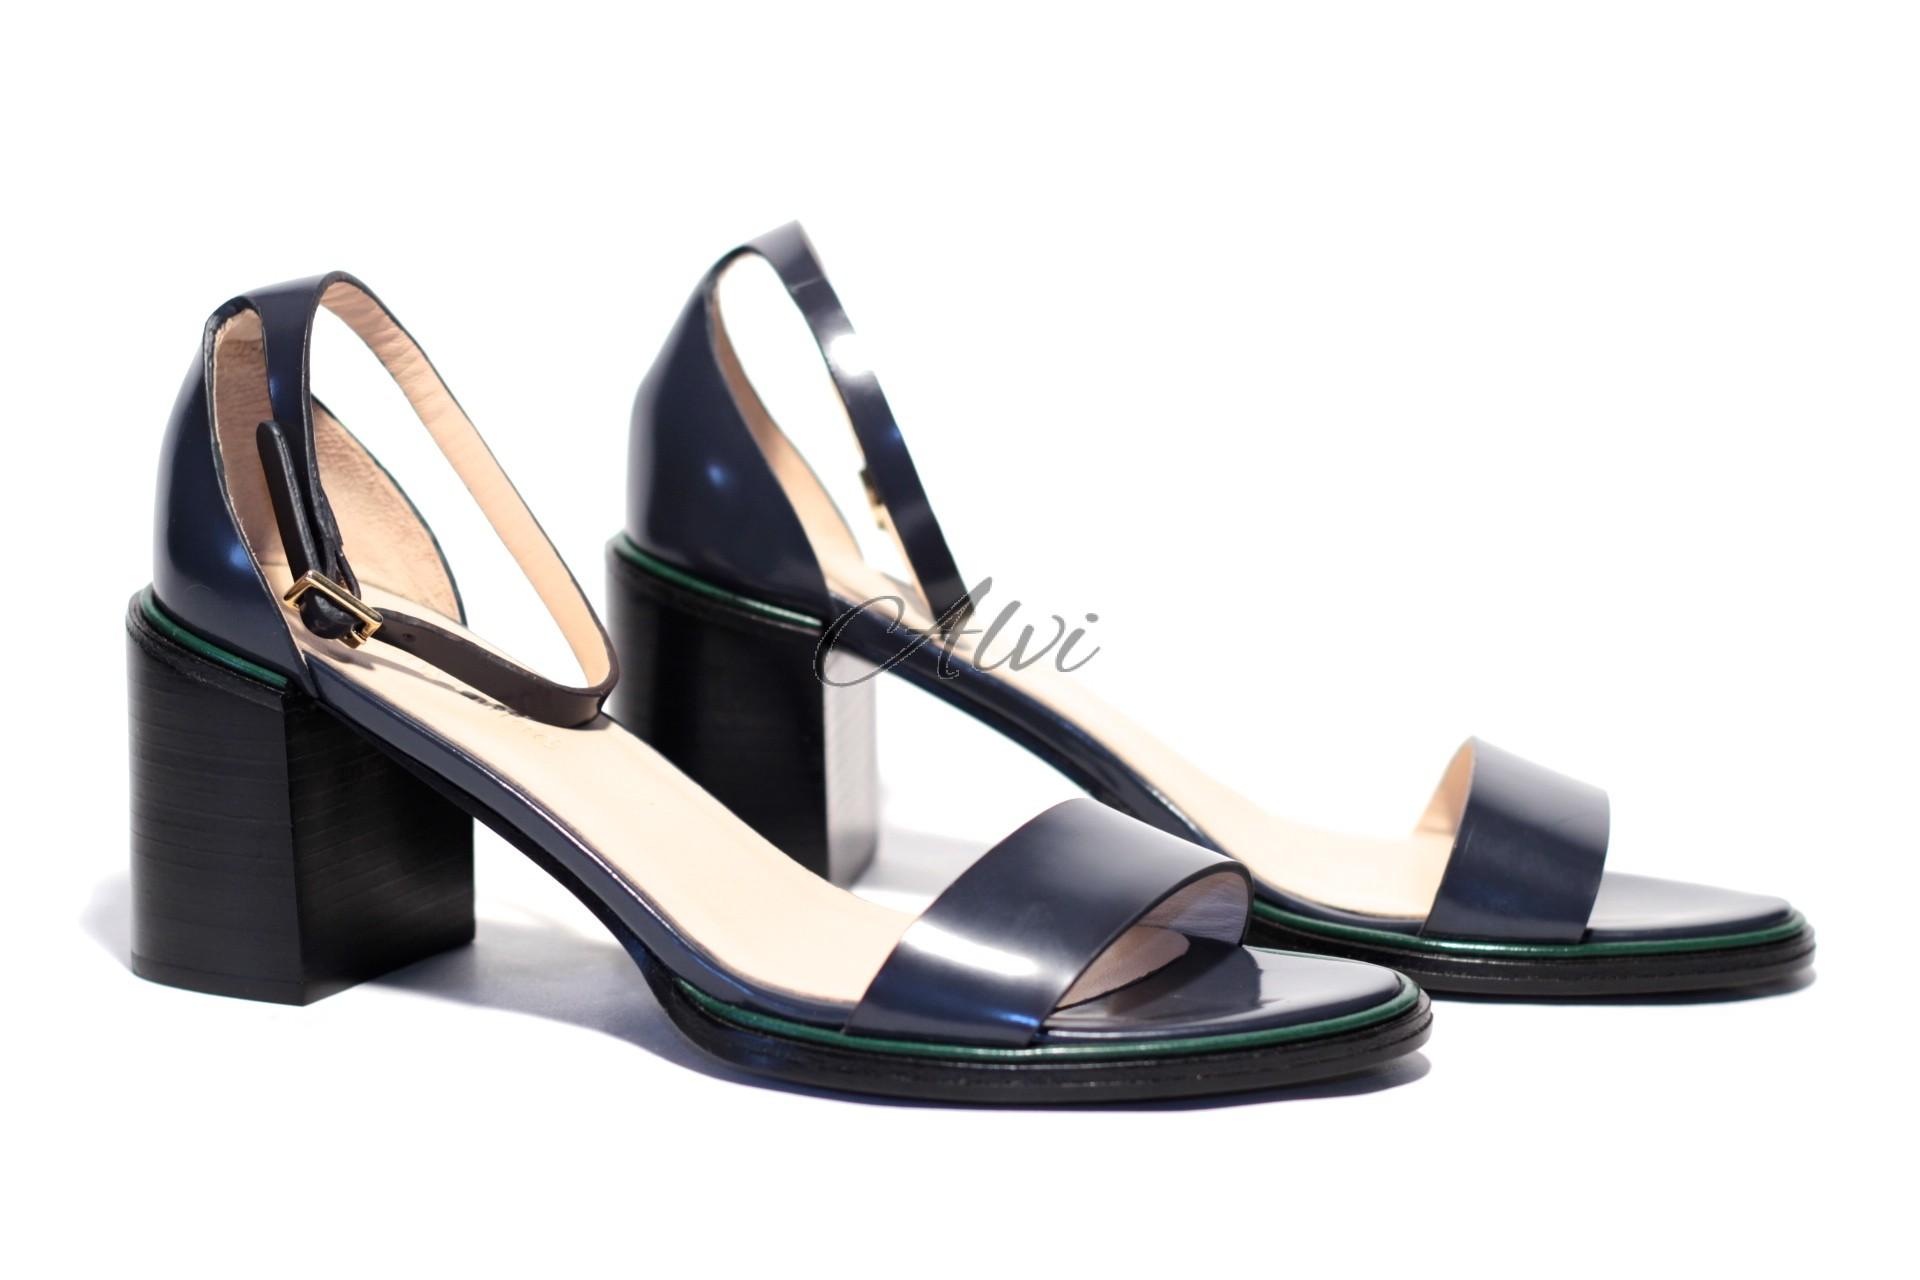 Chloé Medio See Sandalo By Tacco Blu Vzuqmsp Dxowqecrbe 0OknPX8w